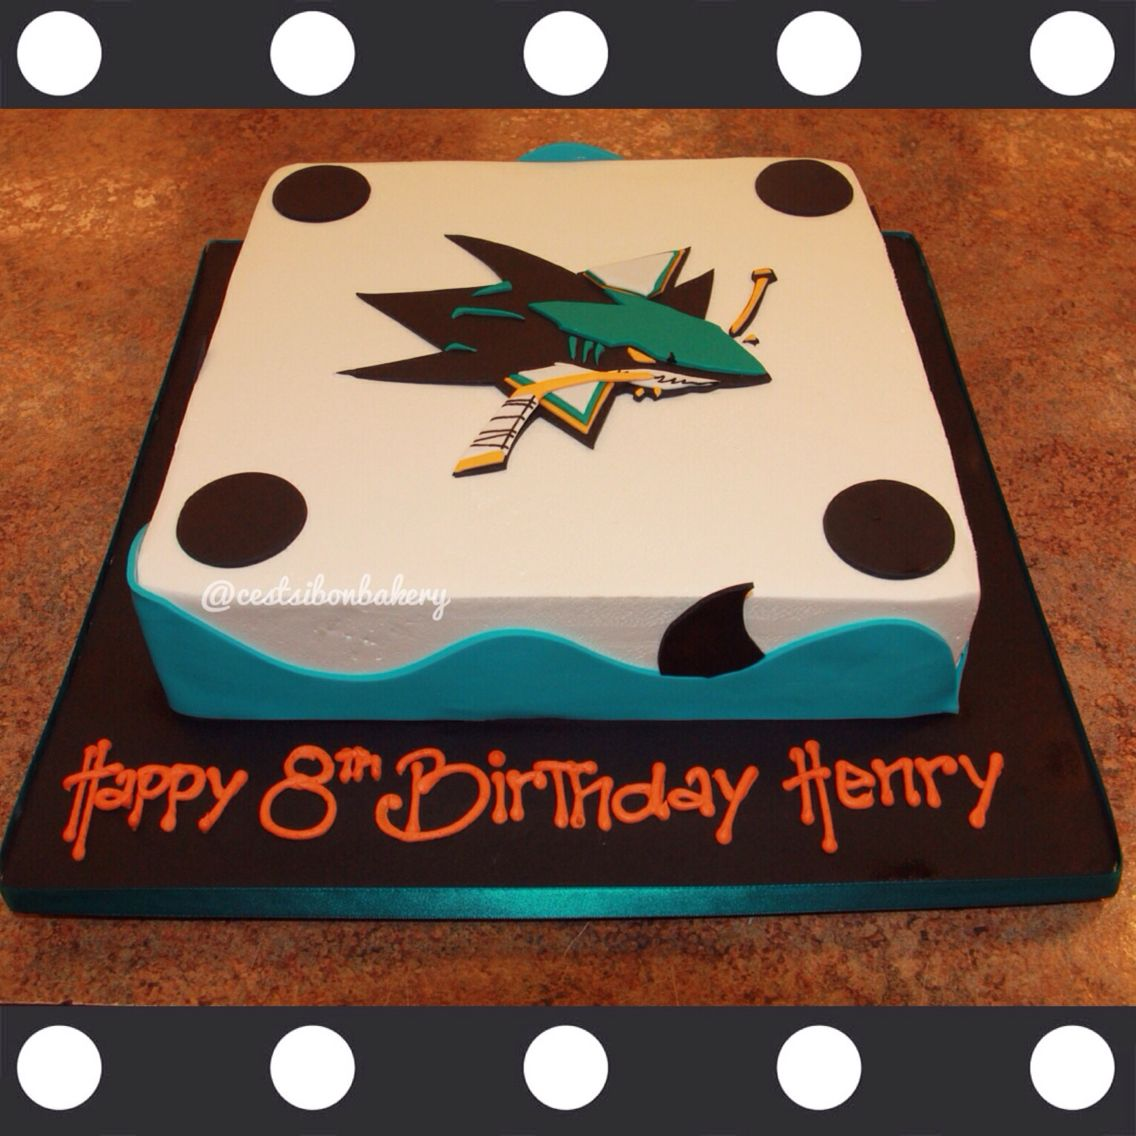 Strange San Jose Sharks Hockey Cake With Images Drake Birthday Party Funny Birthday Cards Online Inifofree Goldxyz